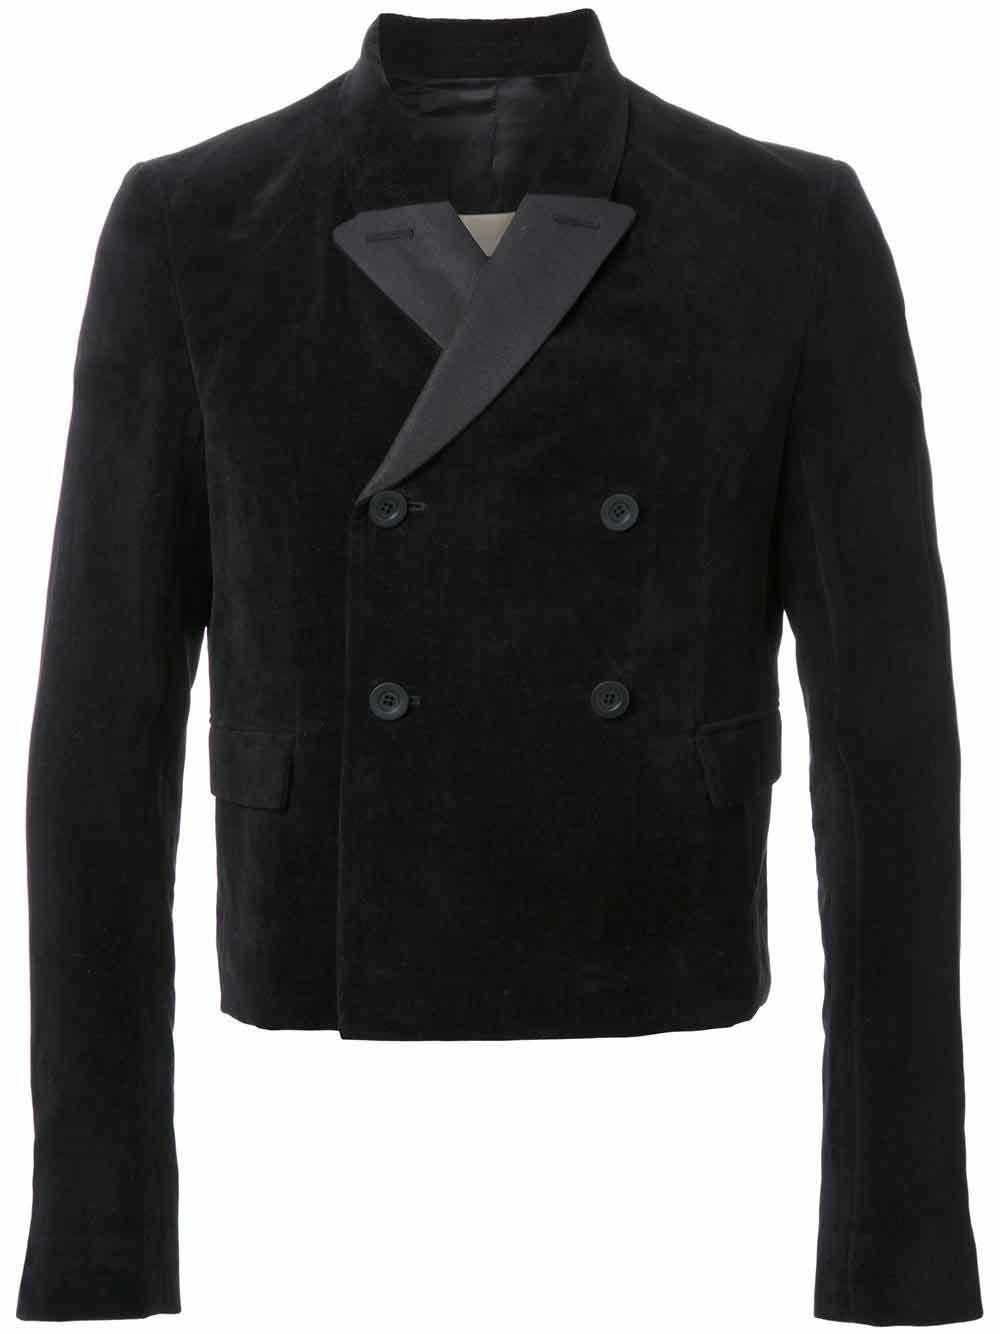 Best Mens Fall/Winter Jacket Styles 2016 By Top Brands | Men ...